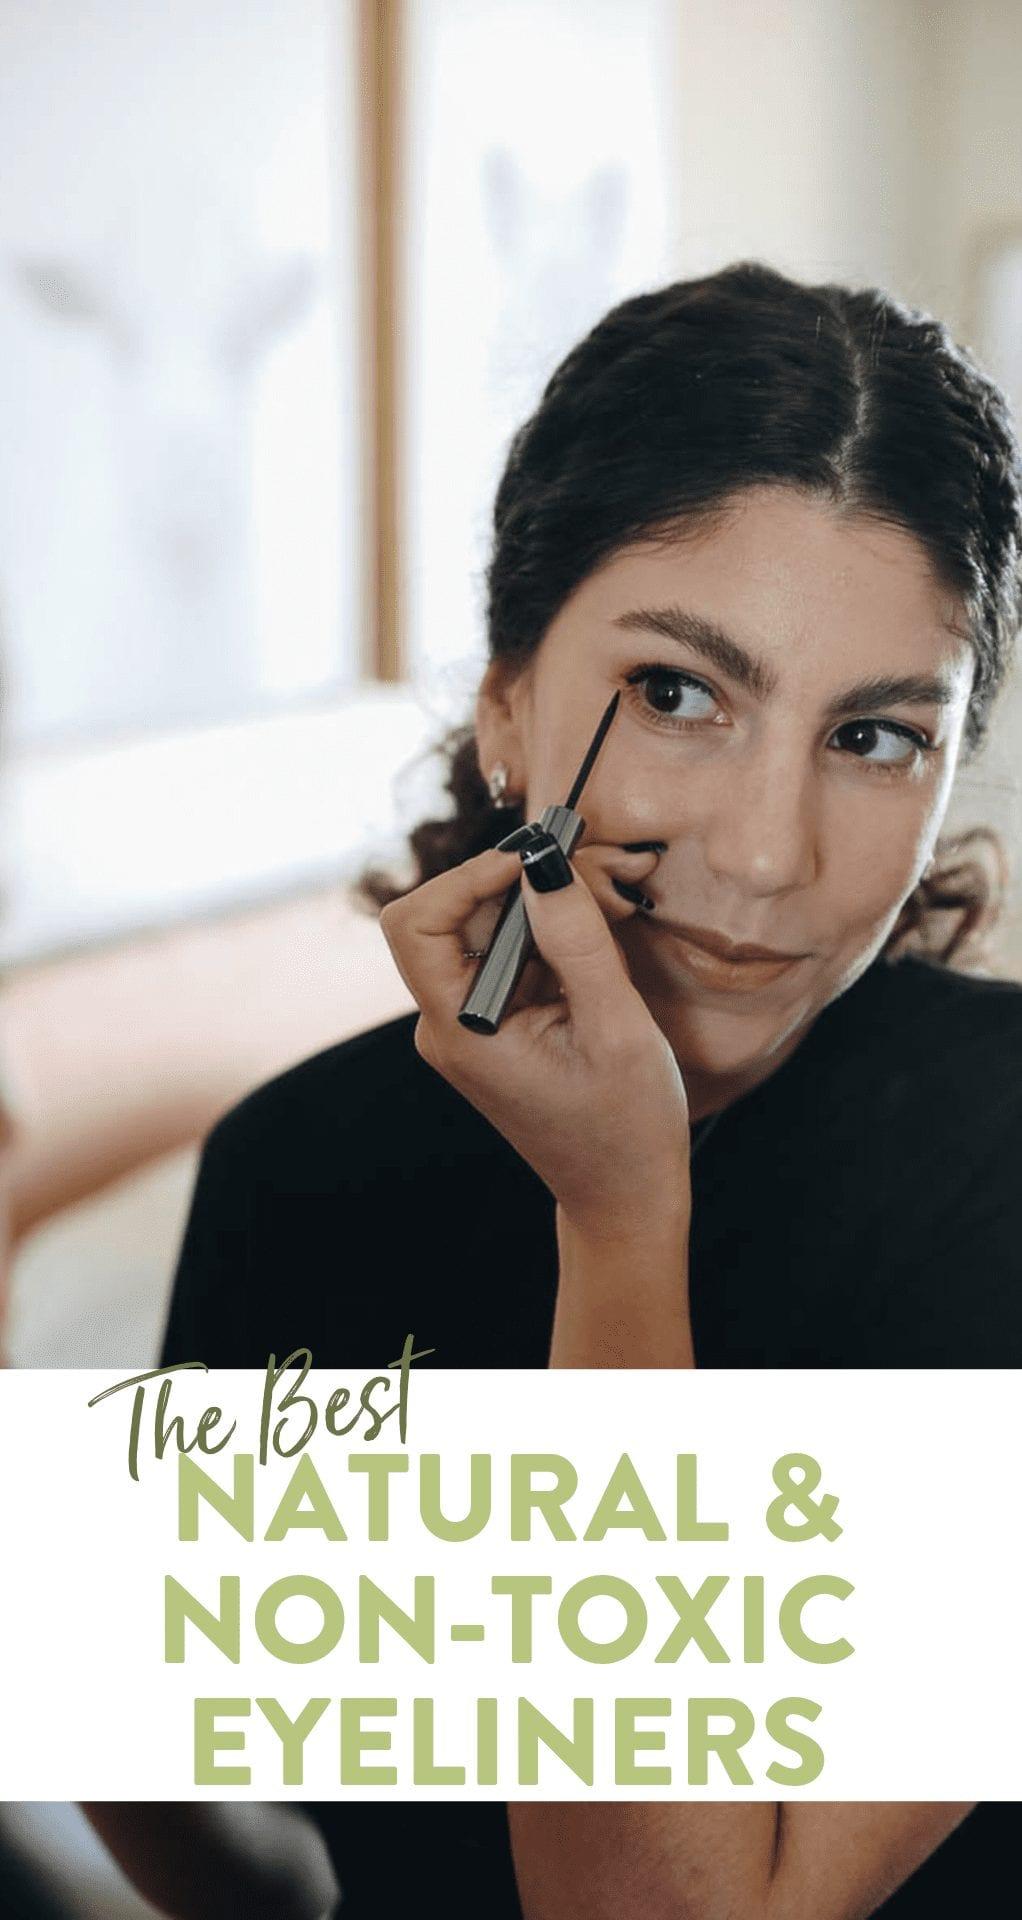 non-toxic eyeliner